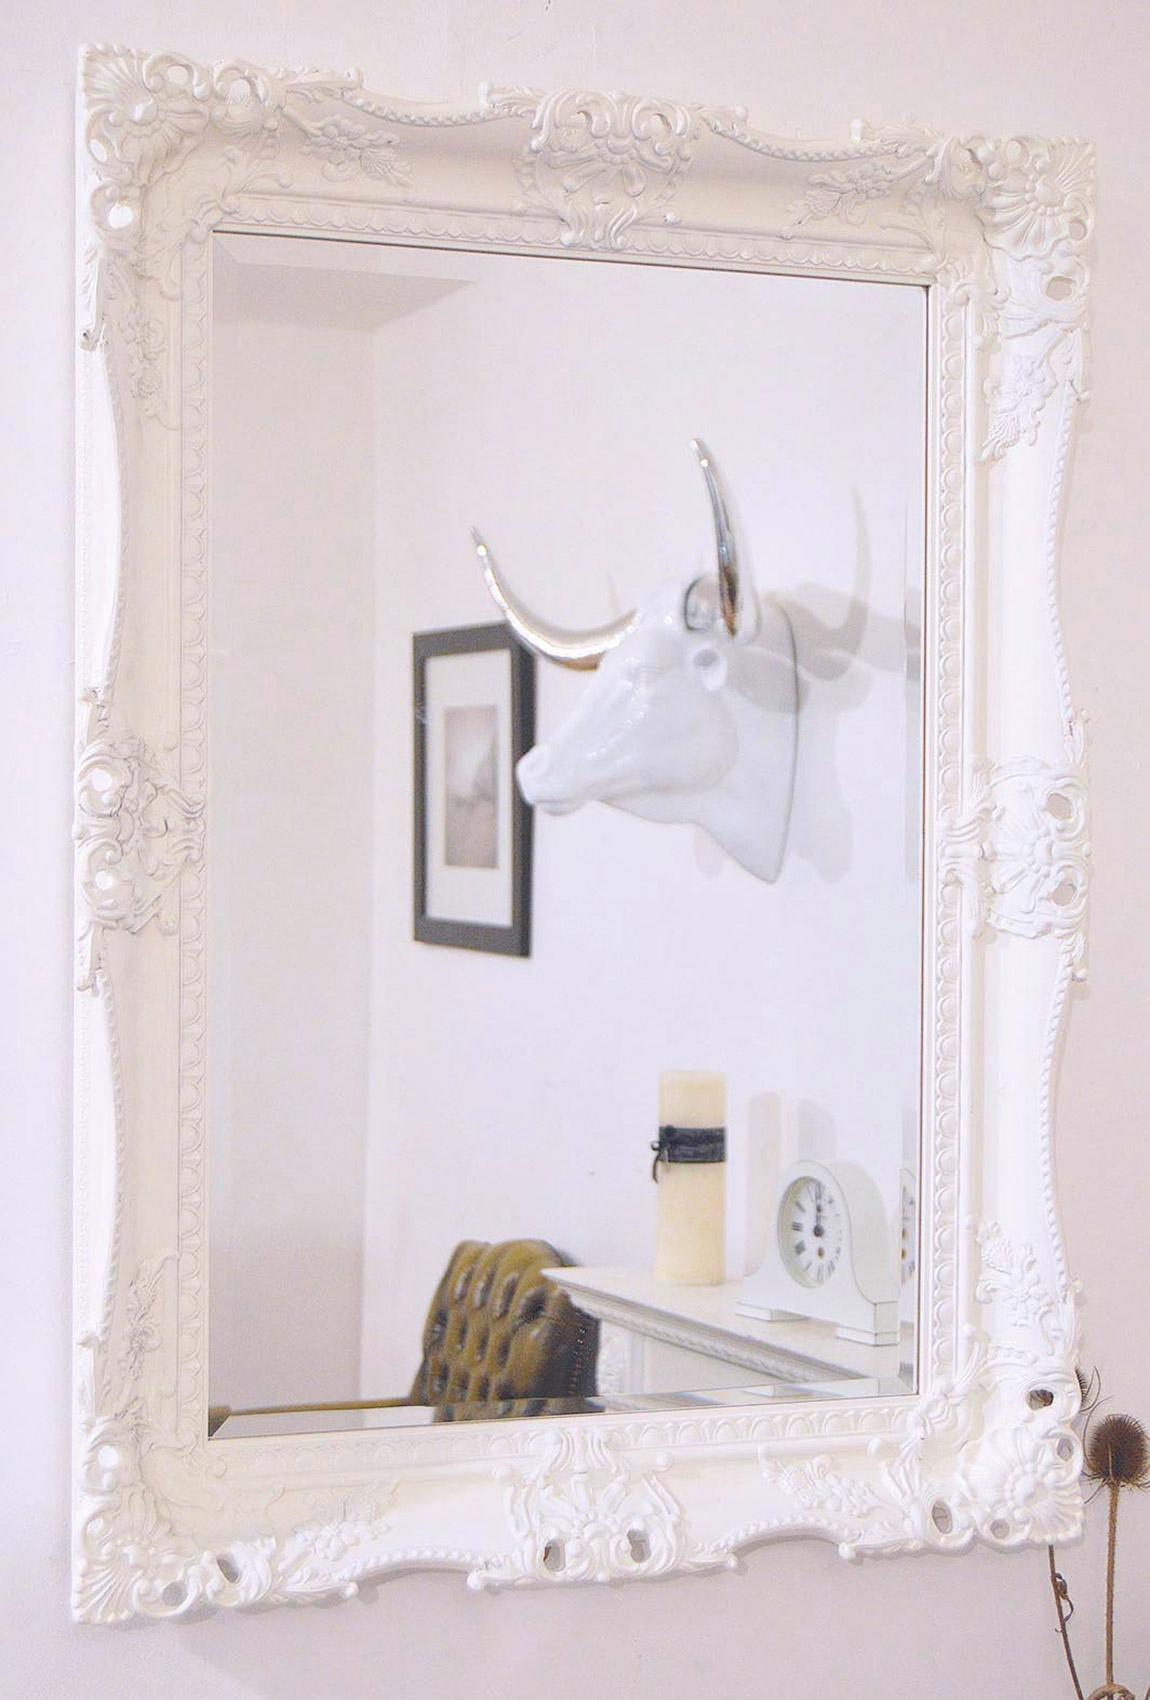 Elaborate White Carved Ornate Swept Frame Mirror 95cm X 80cm Regarding Large White Ornate Mirror (View 15 of 15)